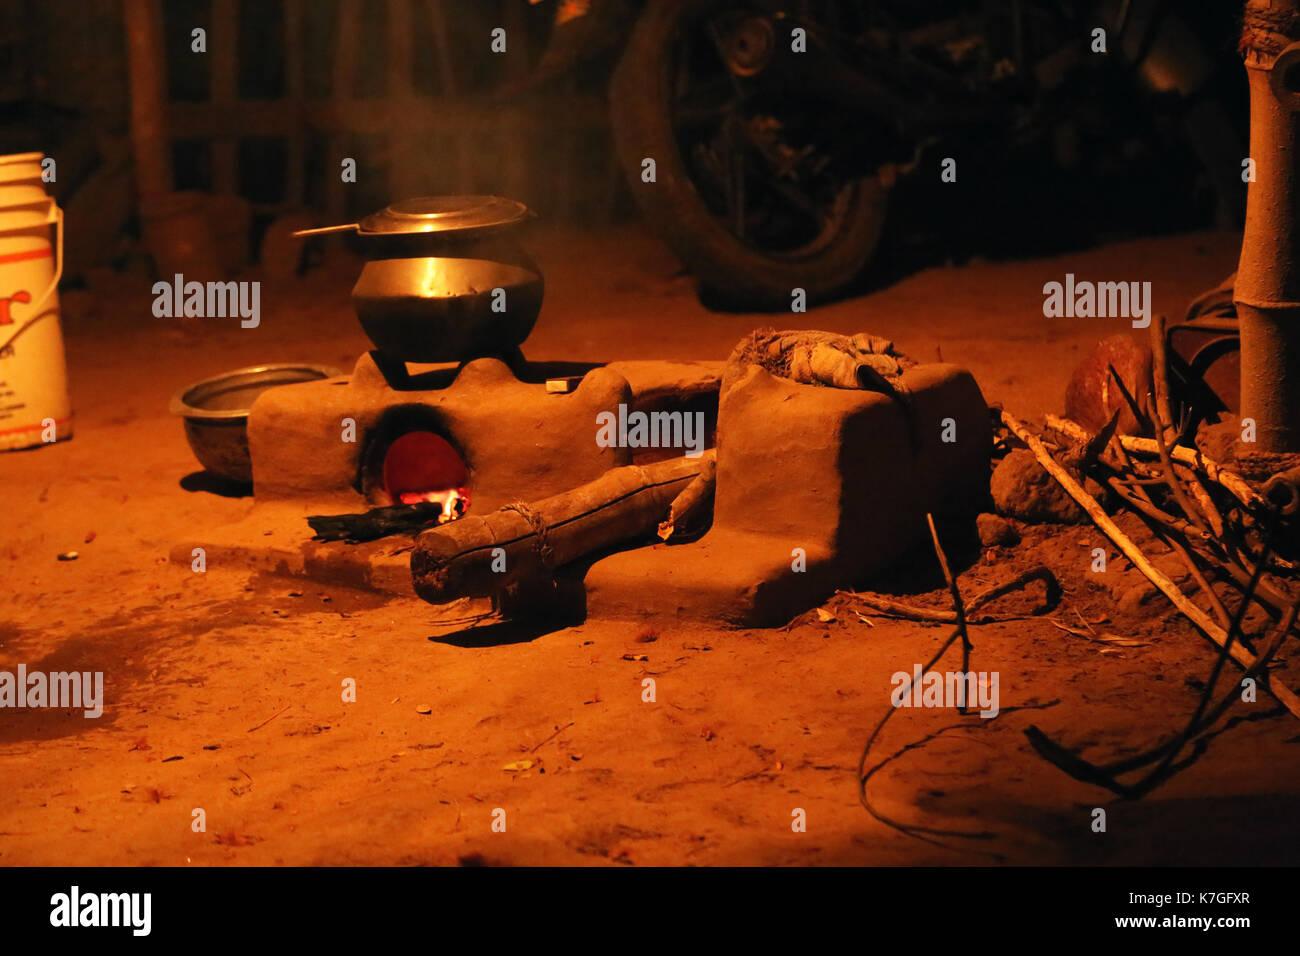 Alamy & Indian village modern kitchen Stock Photo: 159559647 - Alamy